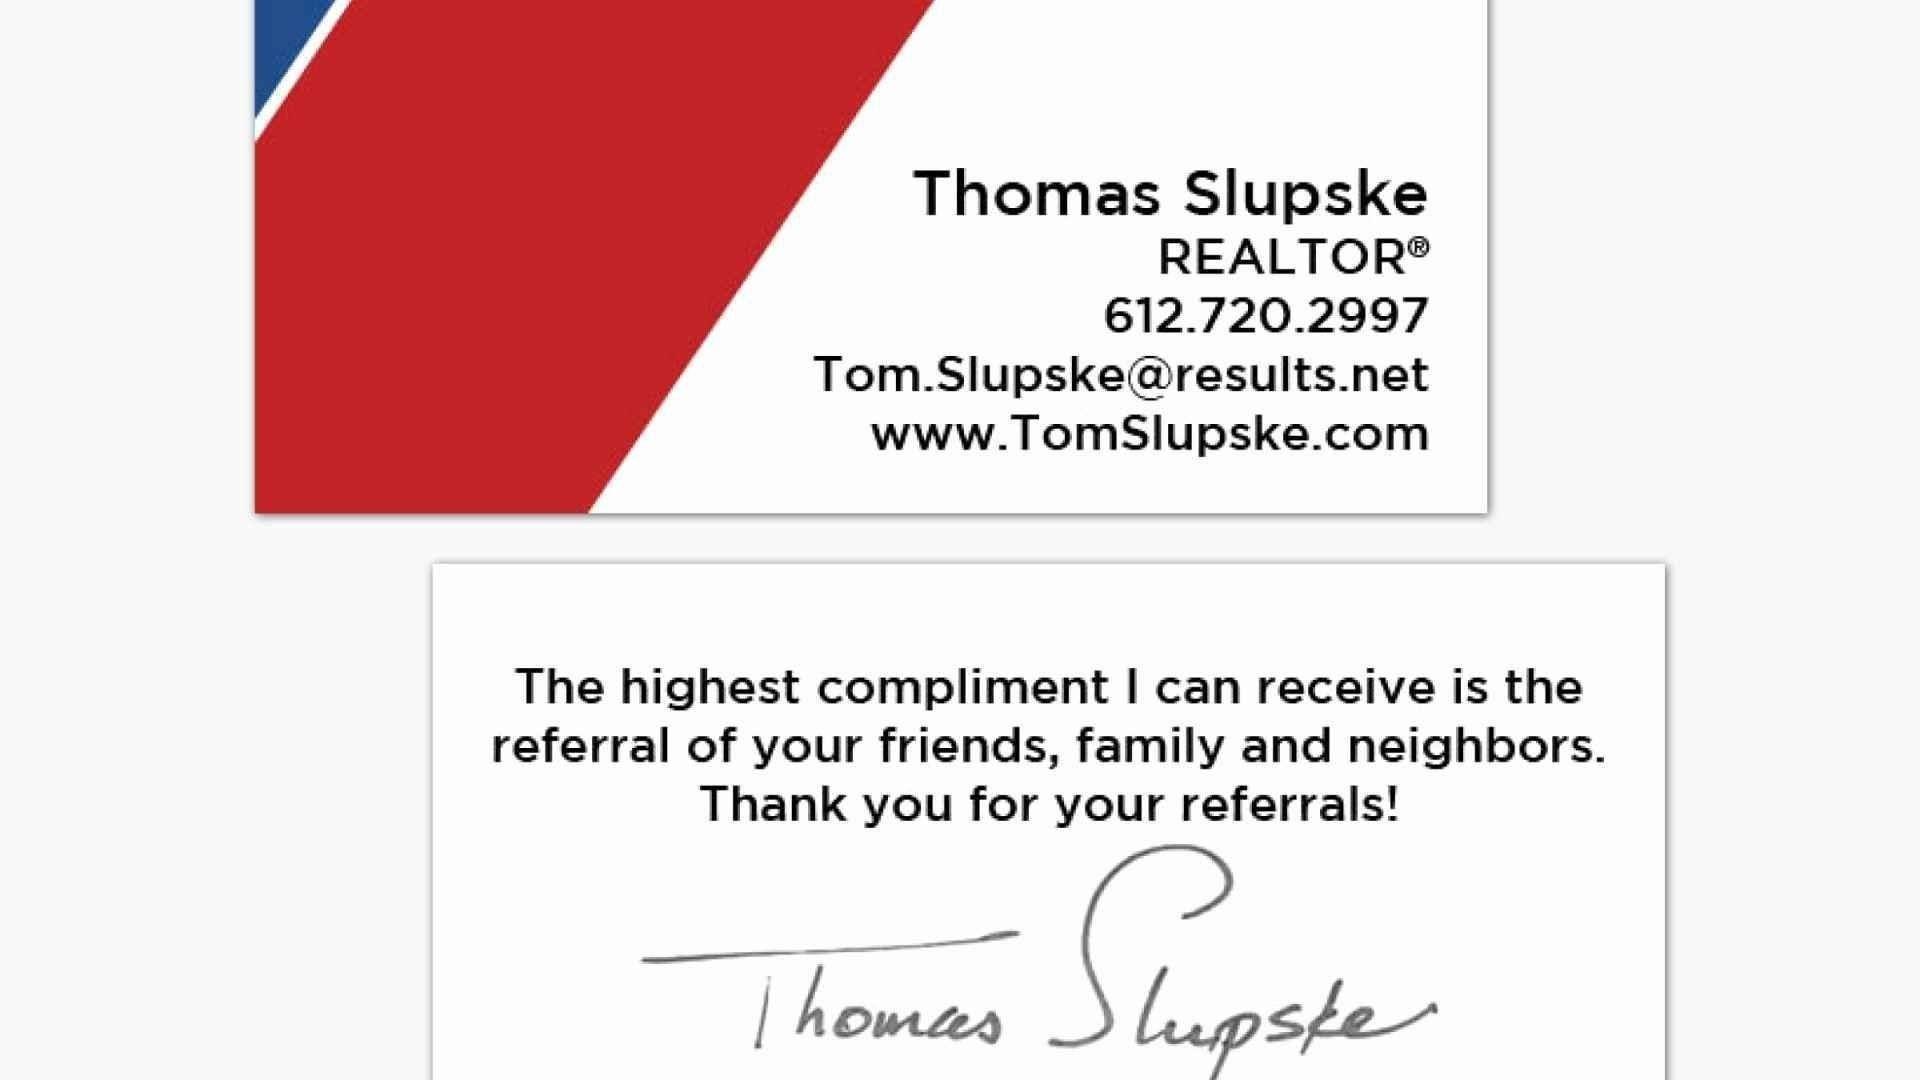 Business Card Template Vistaprint Inspirational Vistaprint Business Card Templ Business Card Template Psd Create Business Cards Business Cards Vector Templates